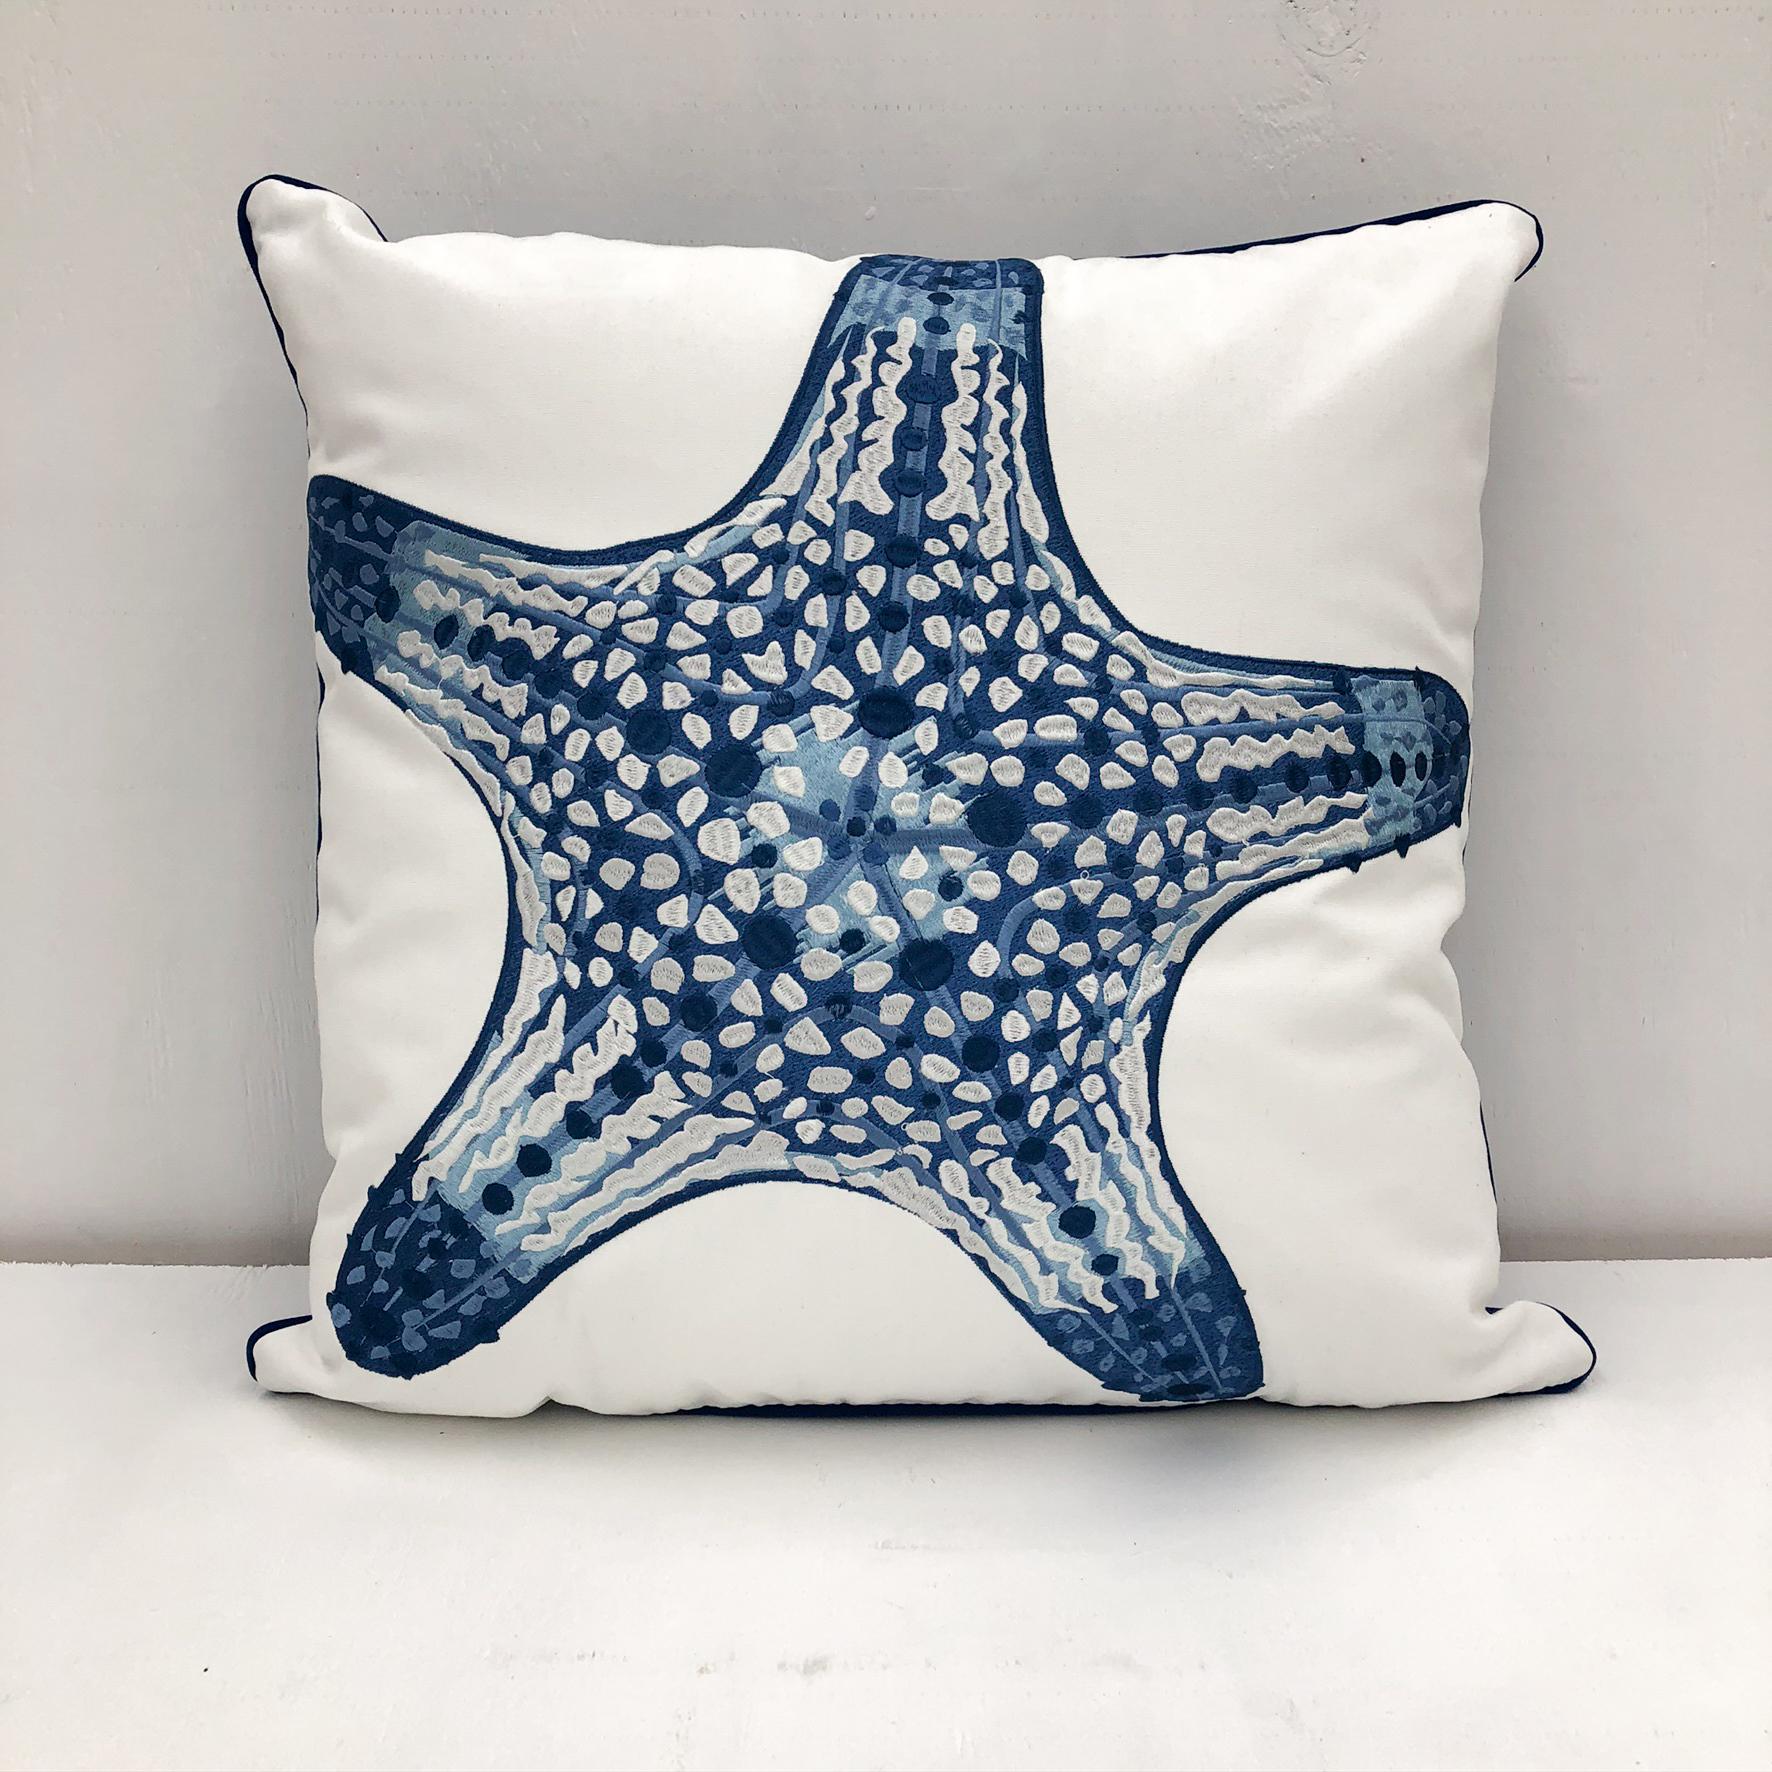 Sunbrella Starfish Pillow - Sunbrella - front view